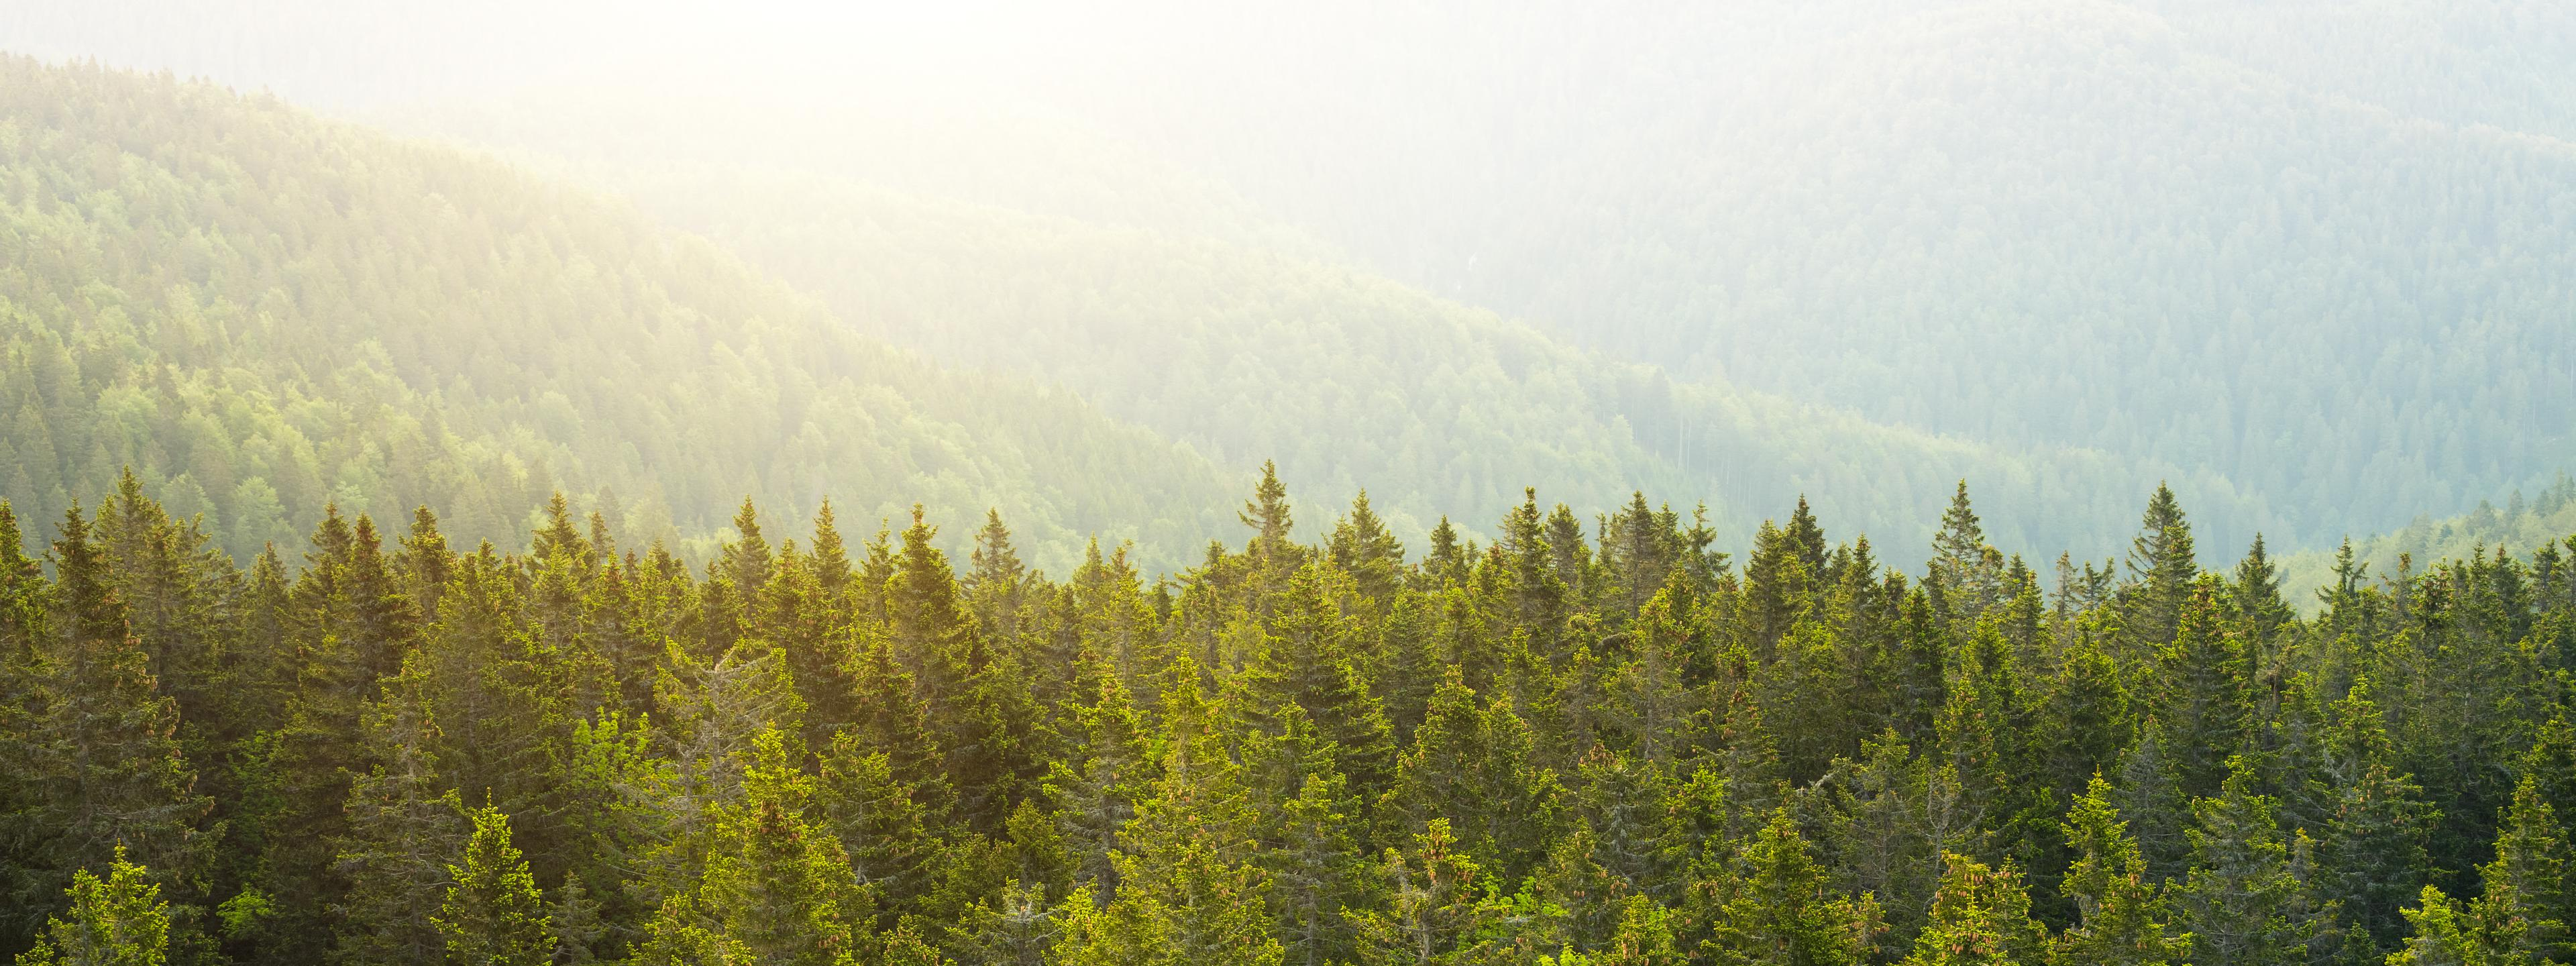 BRITA Vision grüner Wald